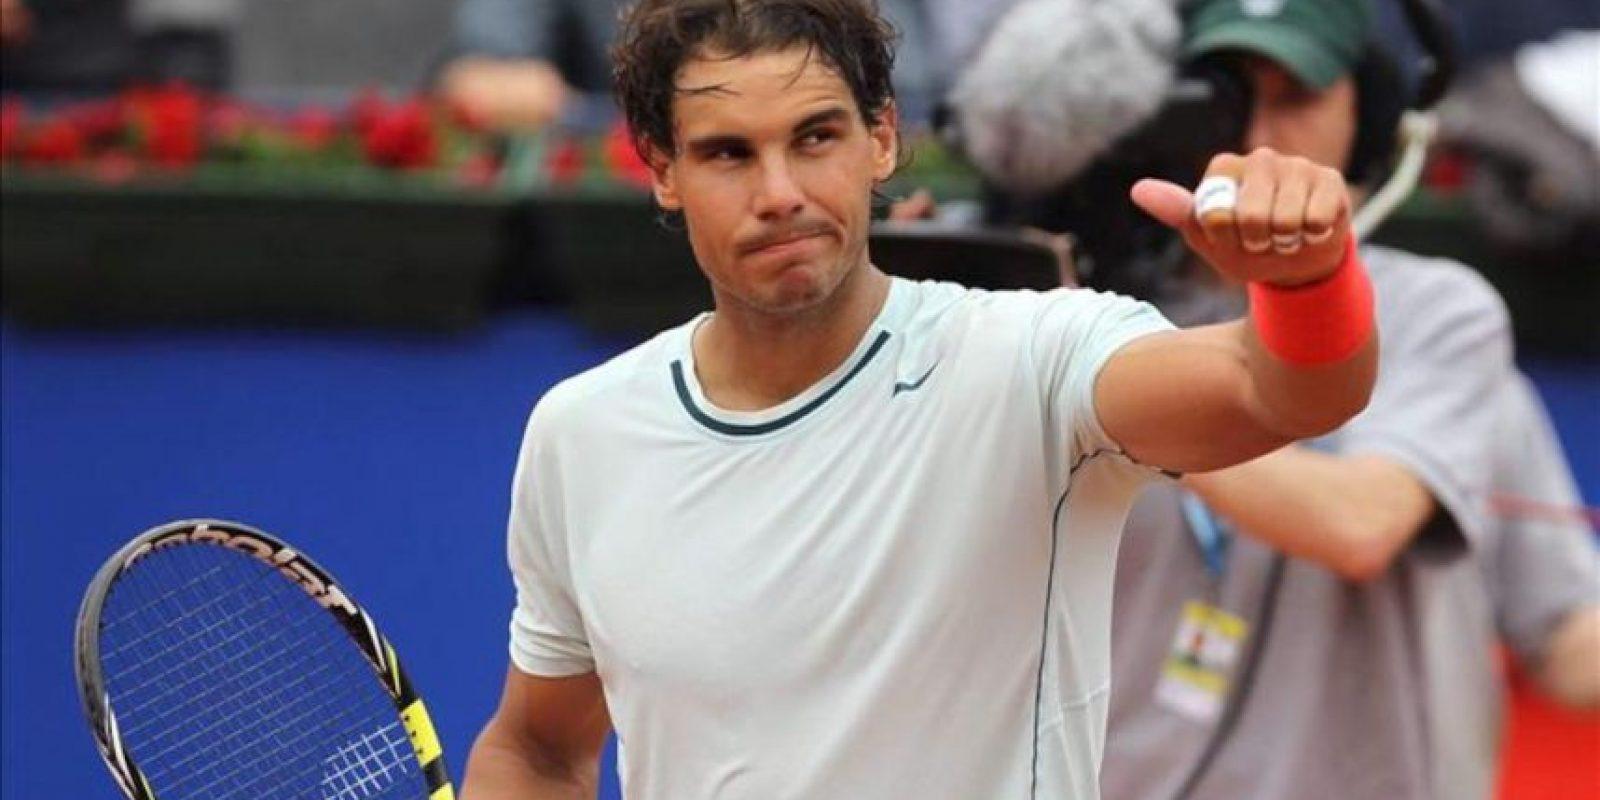 El tenista español Rafa Nadal tras vencer al francés Benoit Paire en los octavos de final del Trofeo Godó. EFE